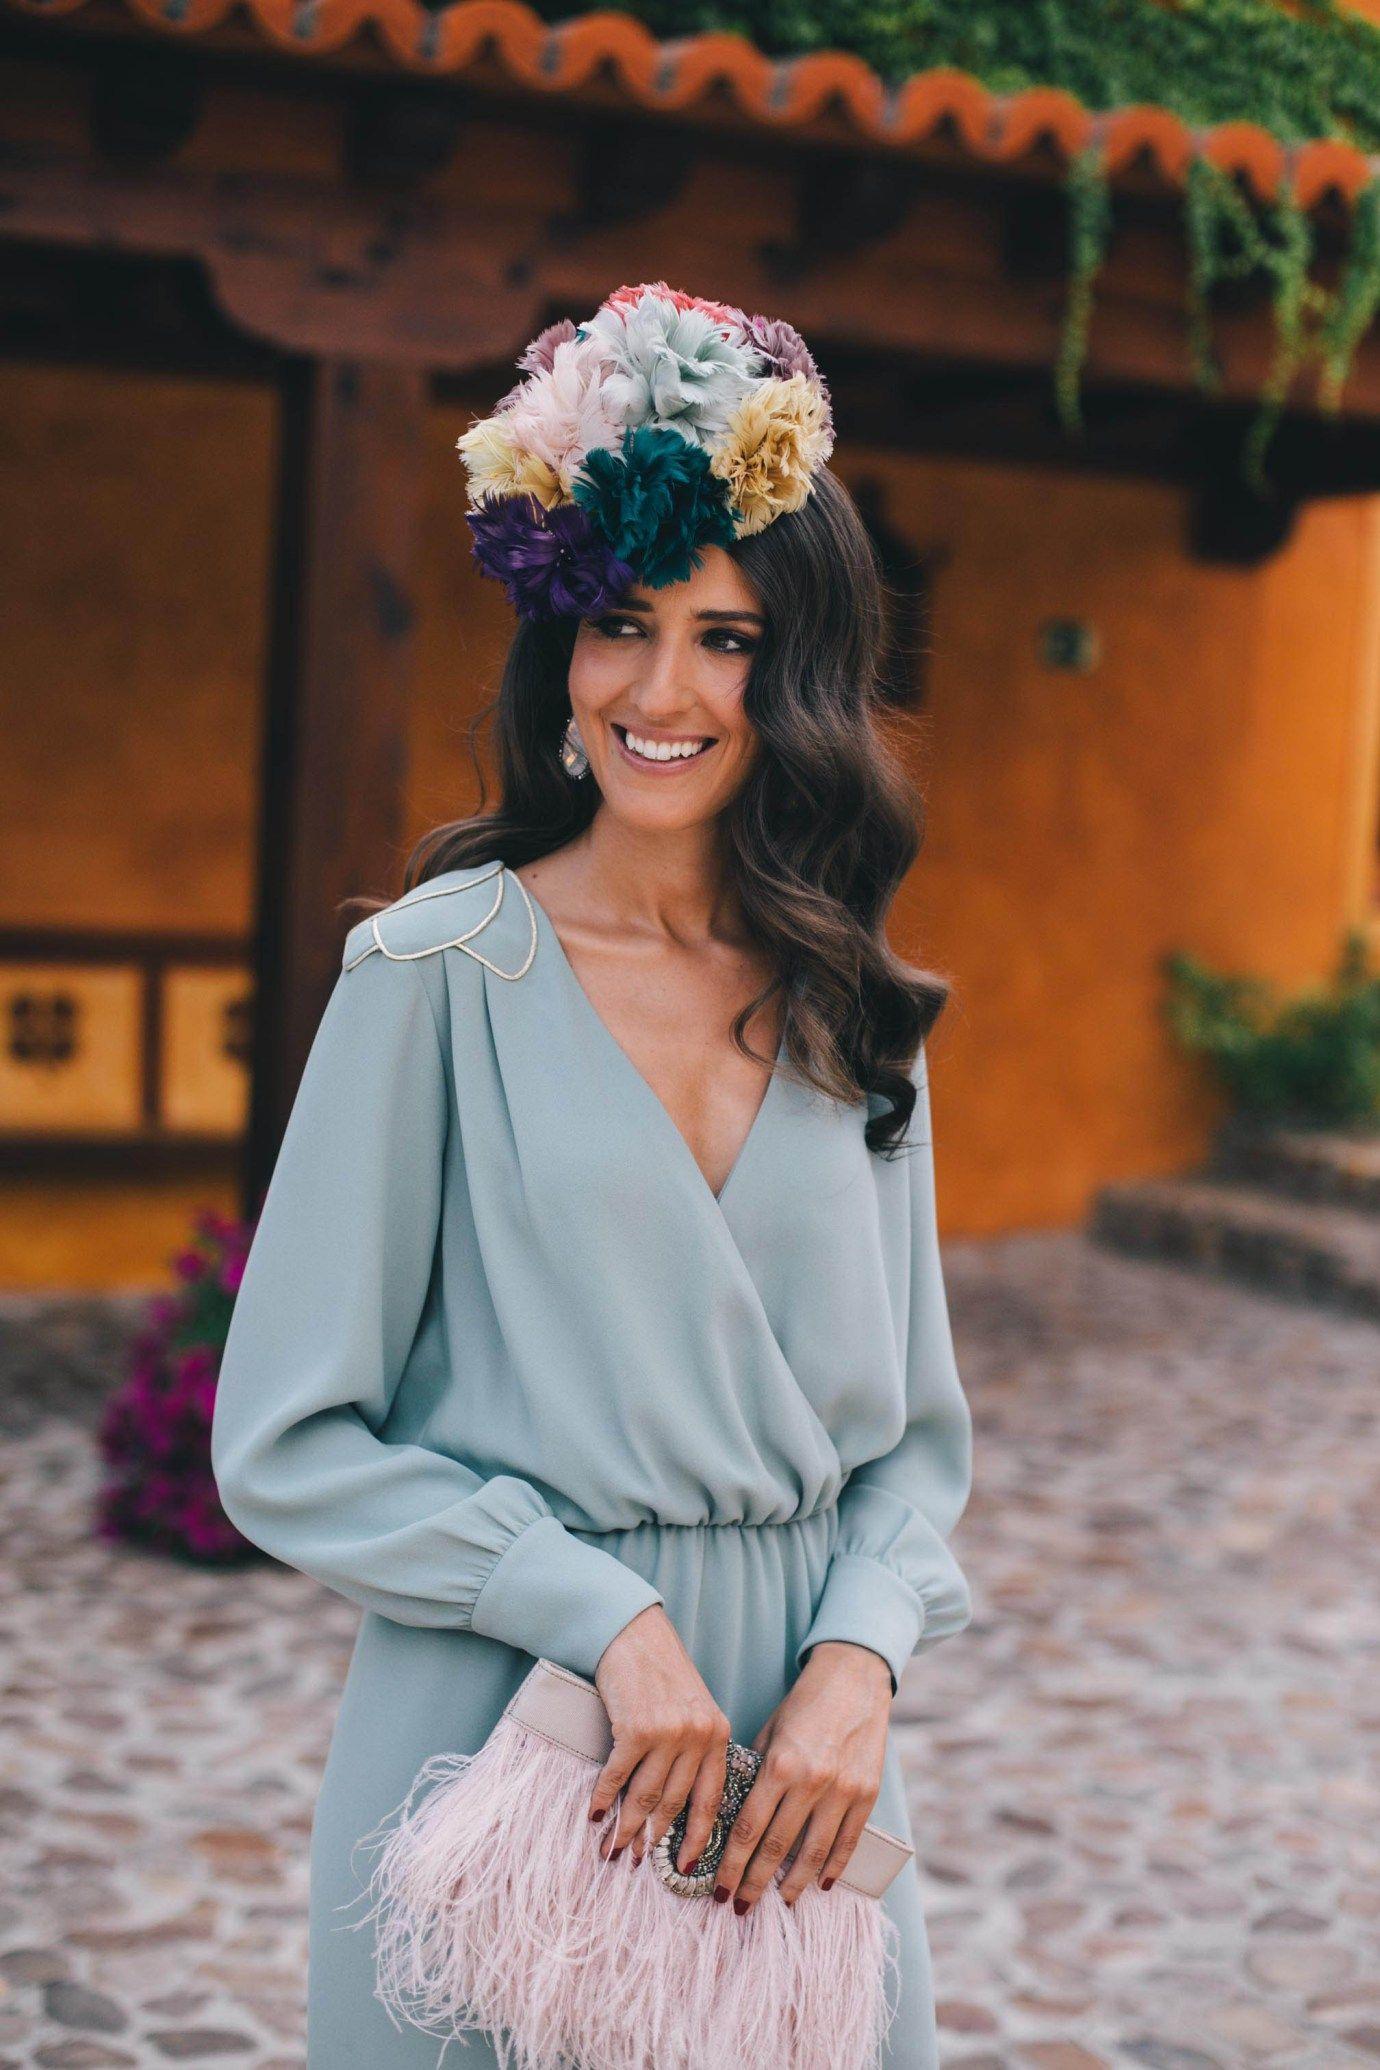 256711b811 Look invitada perfecta boda mañana verde vestido vintage tocado flores  bolso plumas